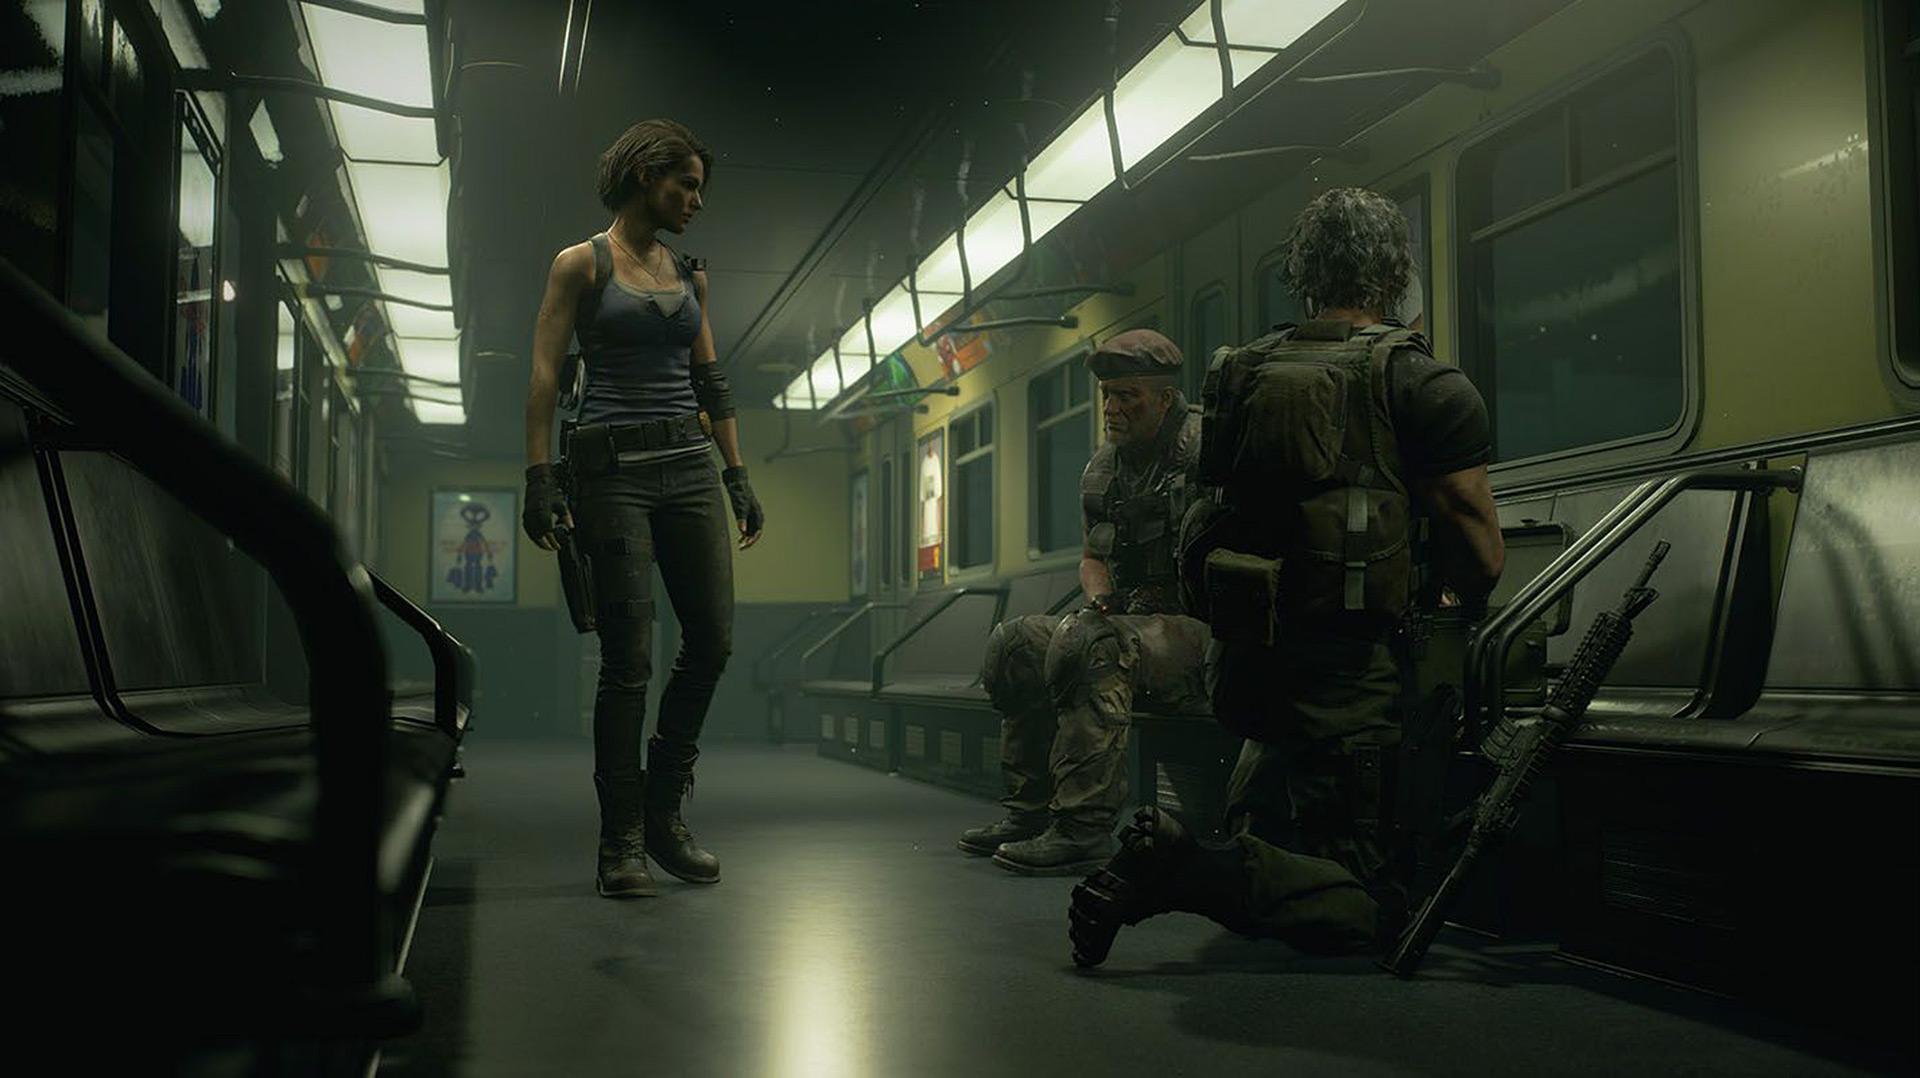 Quelle: Capcom - Resident Evil 3 Remake